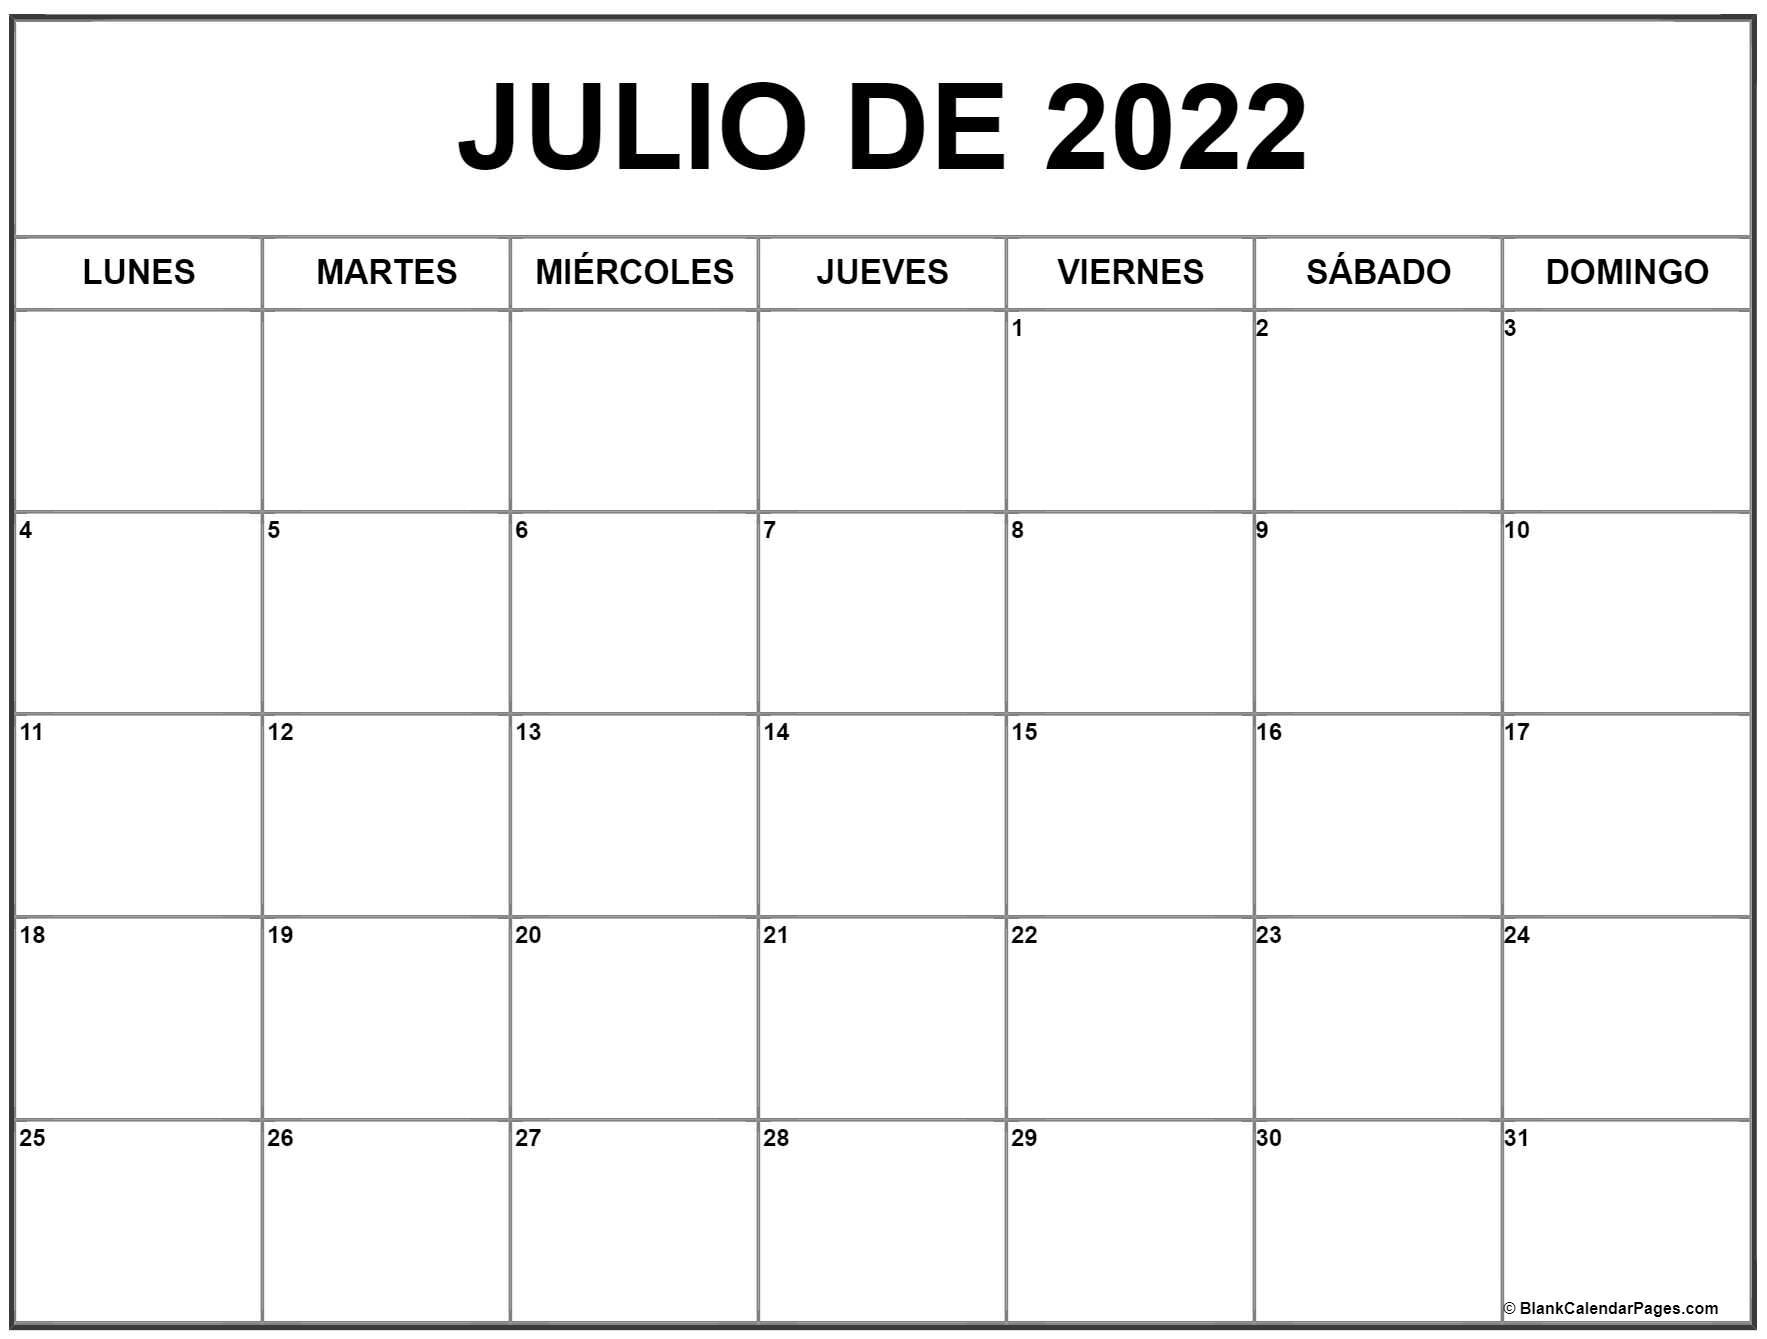 julio de 2020 calendrario